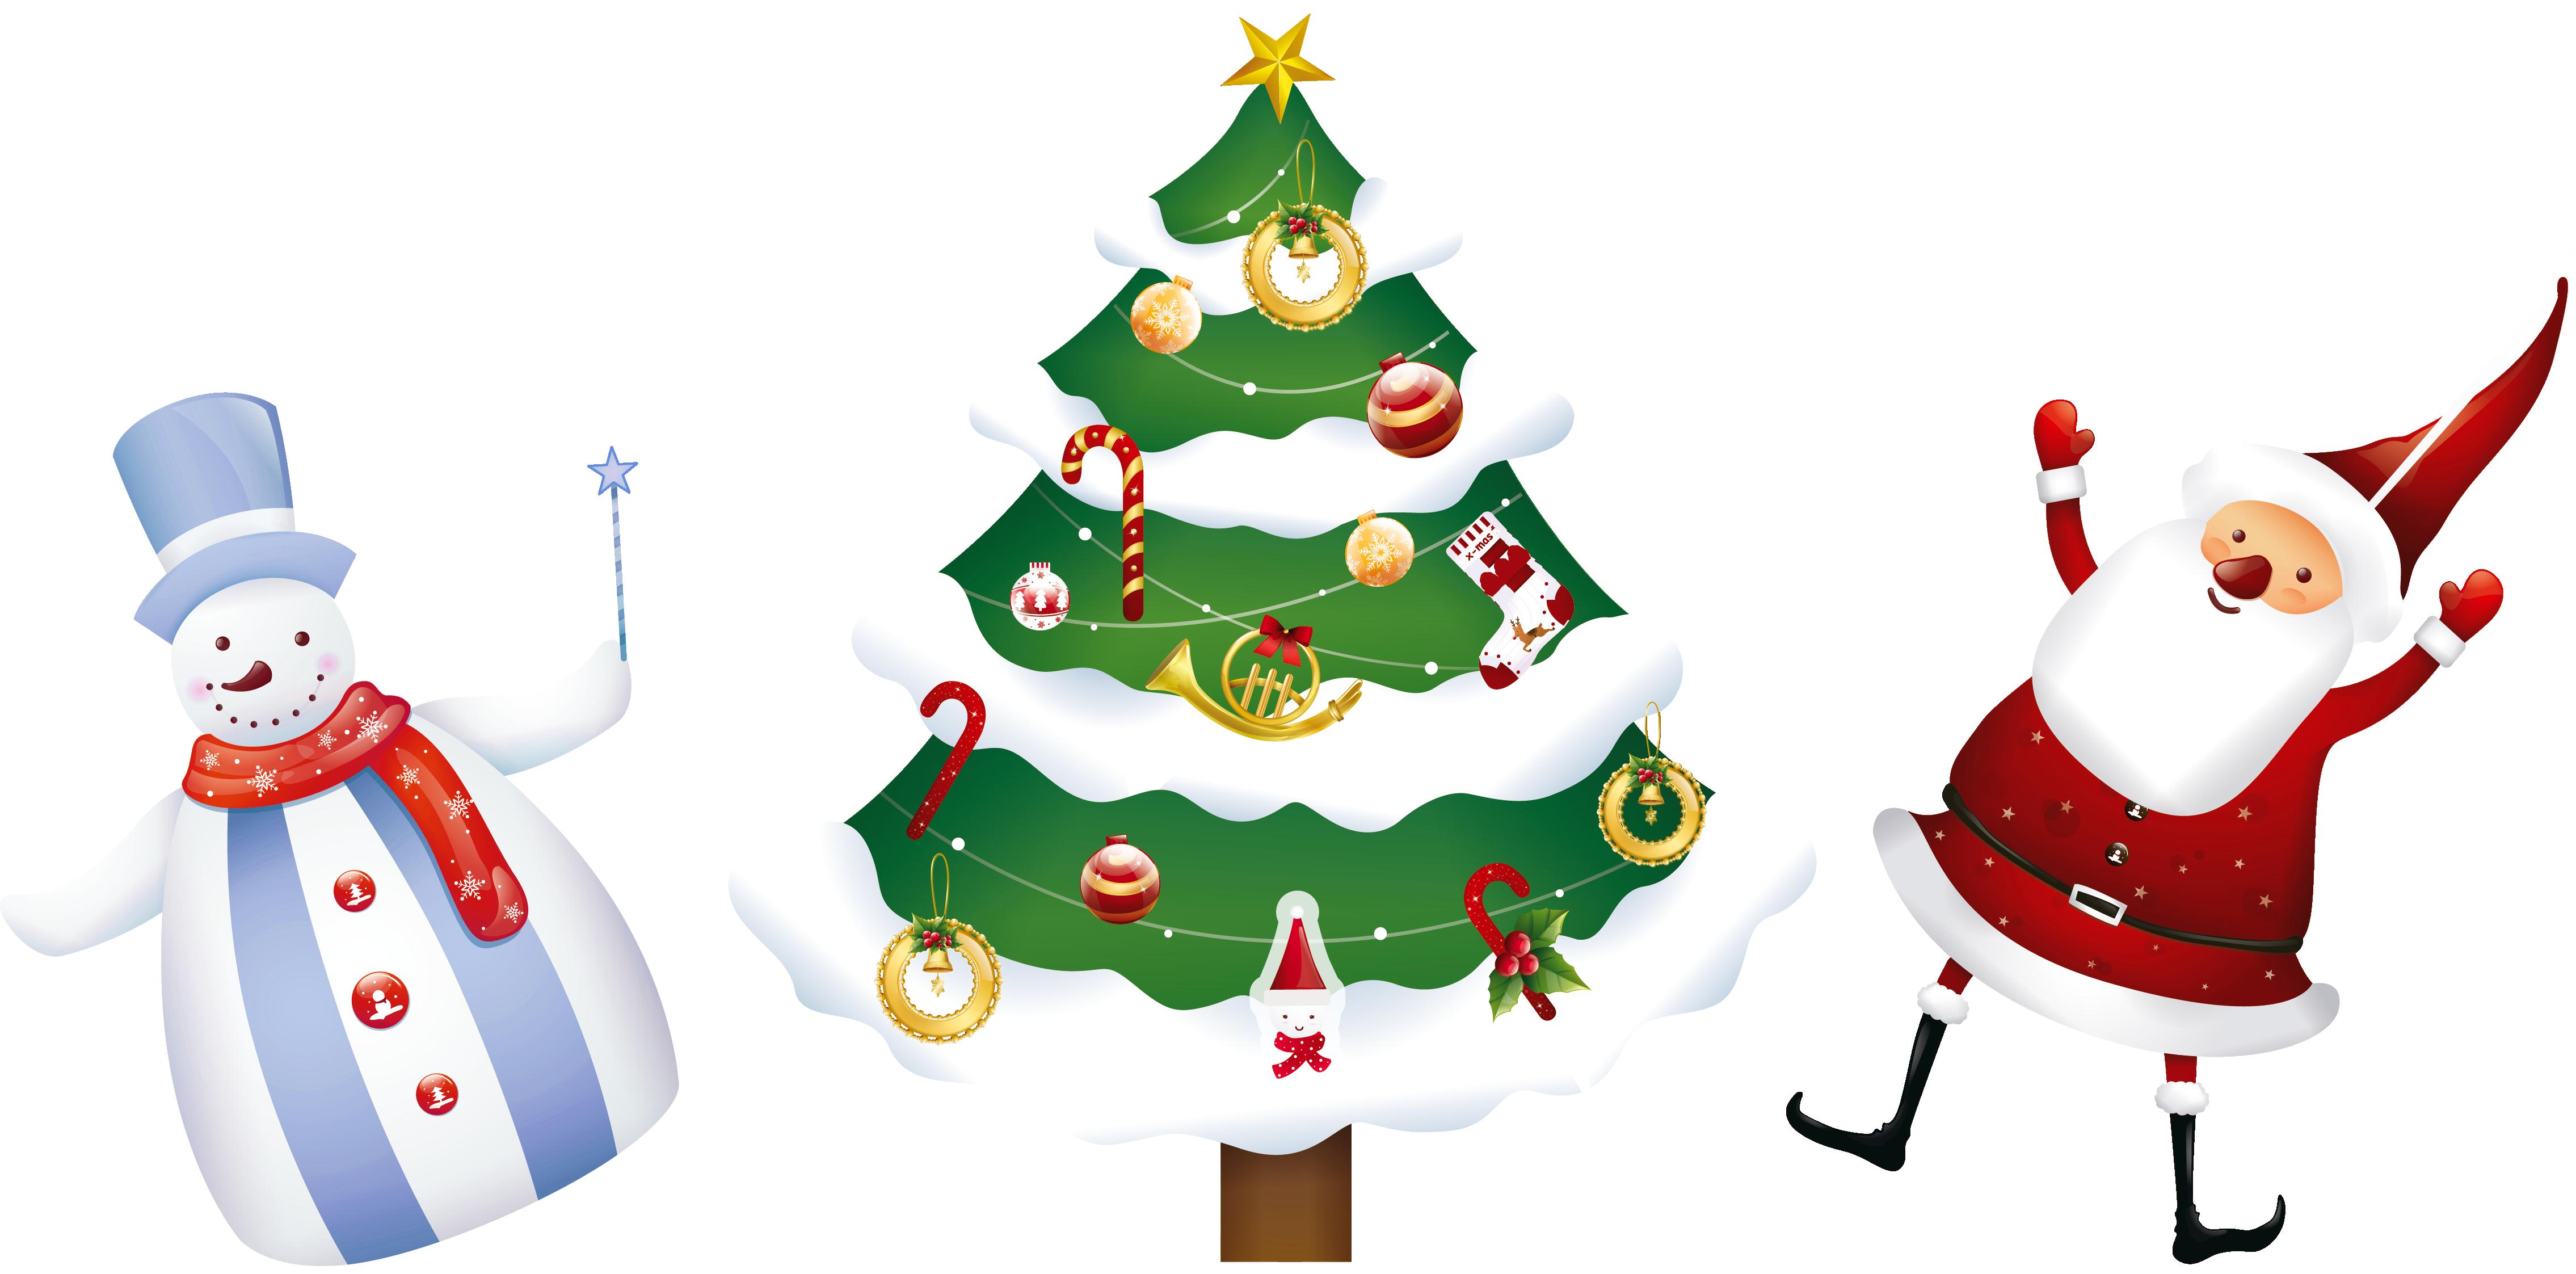 jpg royalty free stock Transparent Christmas Santa Tree and Snowman PNG Clipart